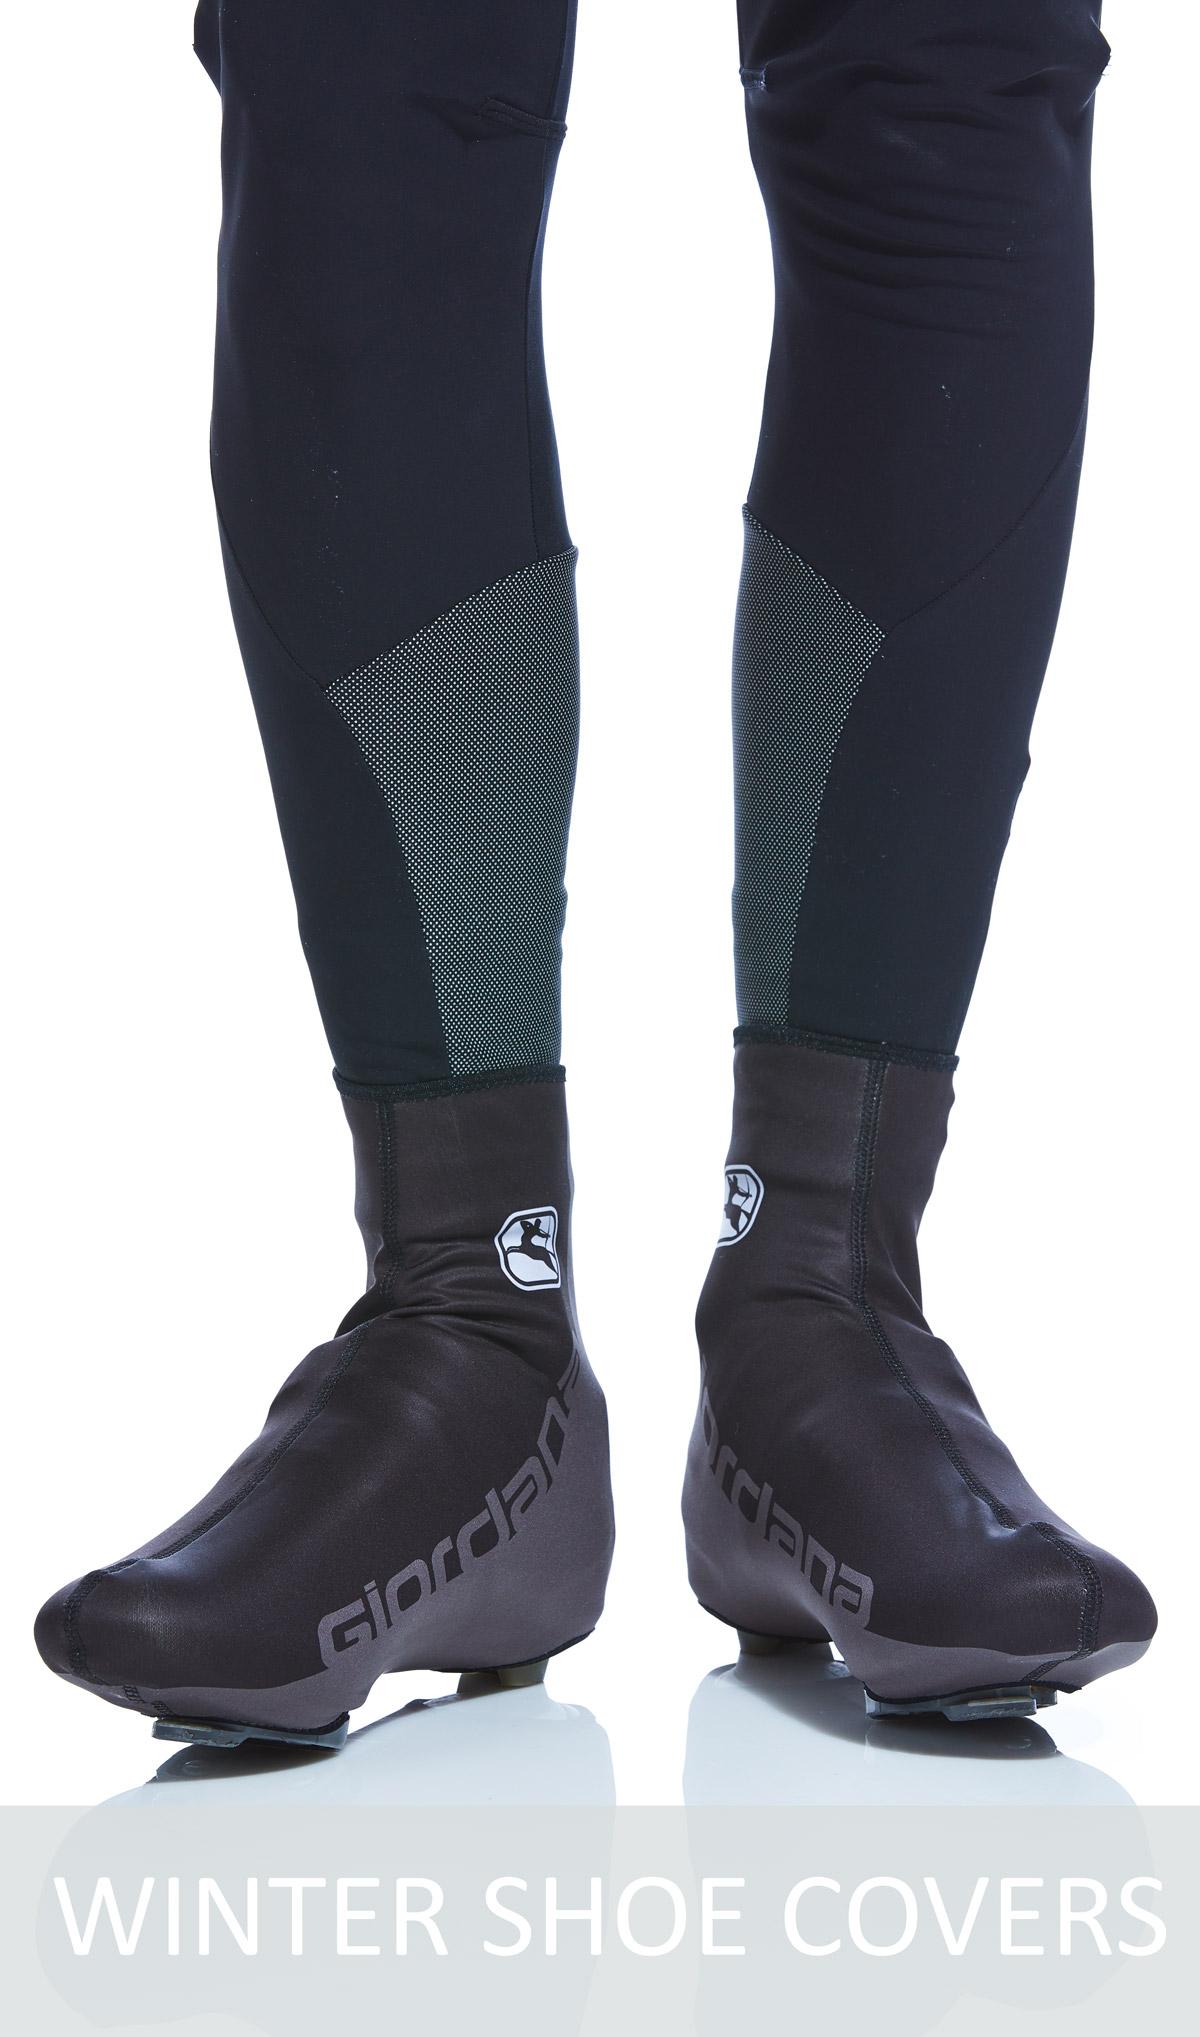 Winter-Shoe-Covers.jpg